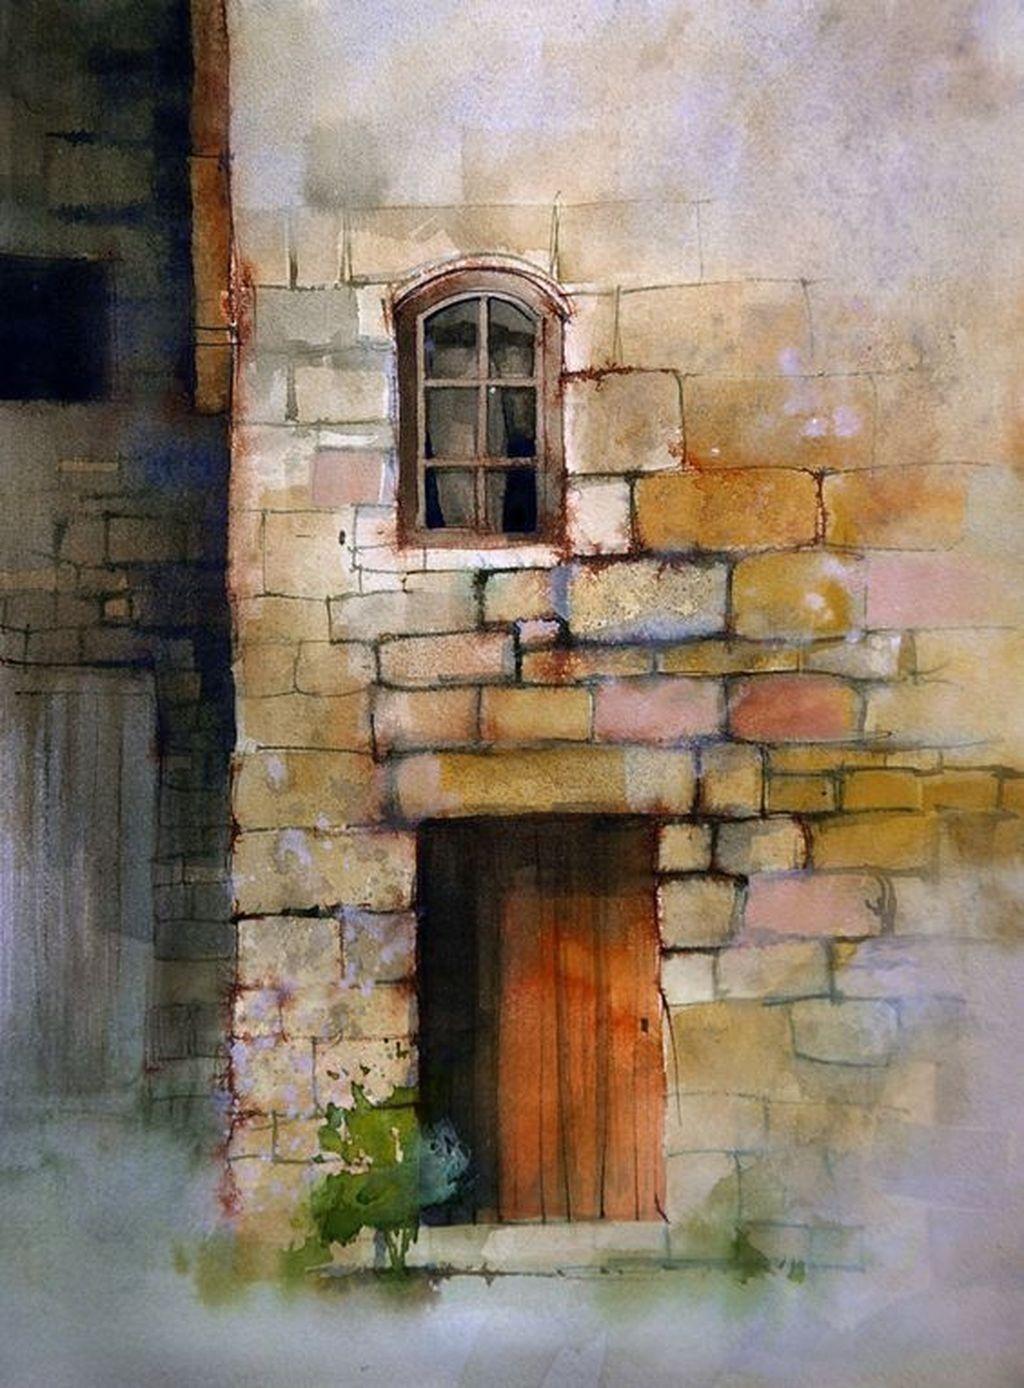 30 Inspiring Wall Painting Ideas For Your Home La Peinture De